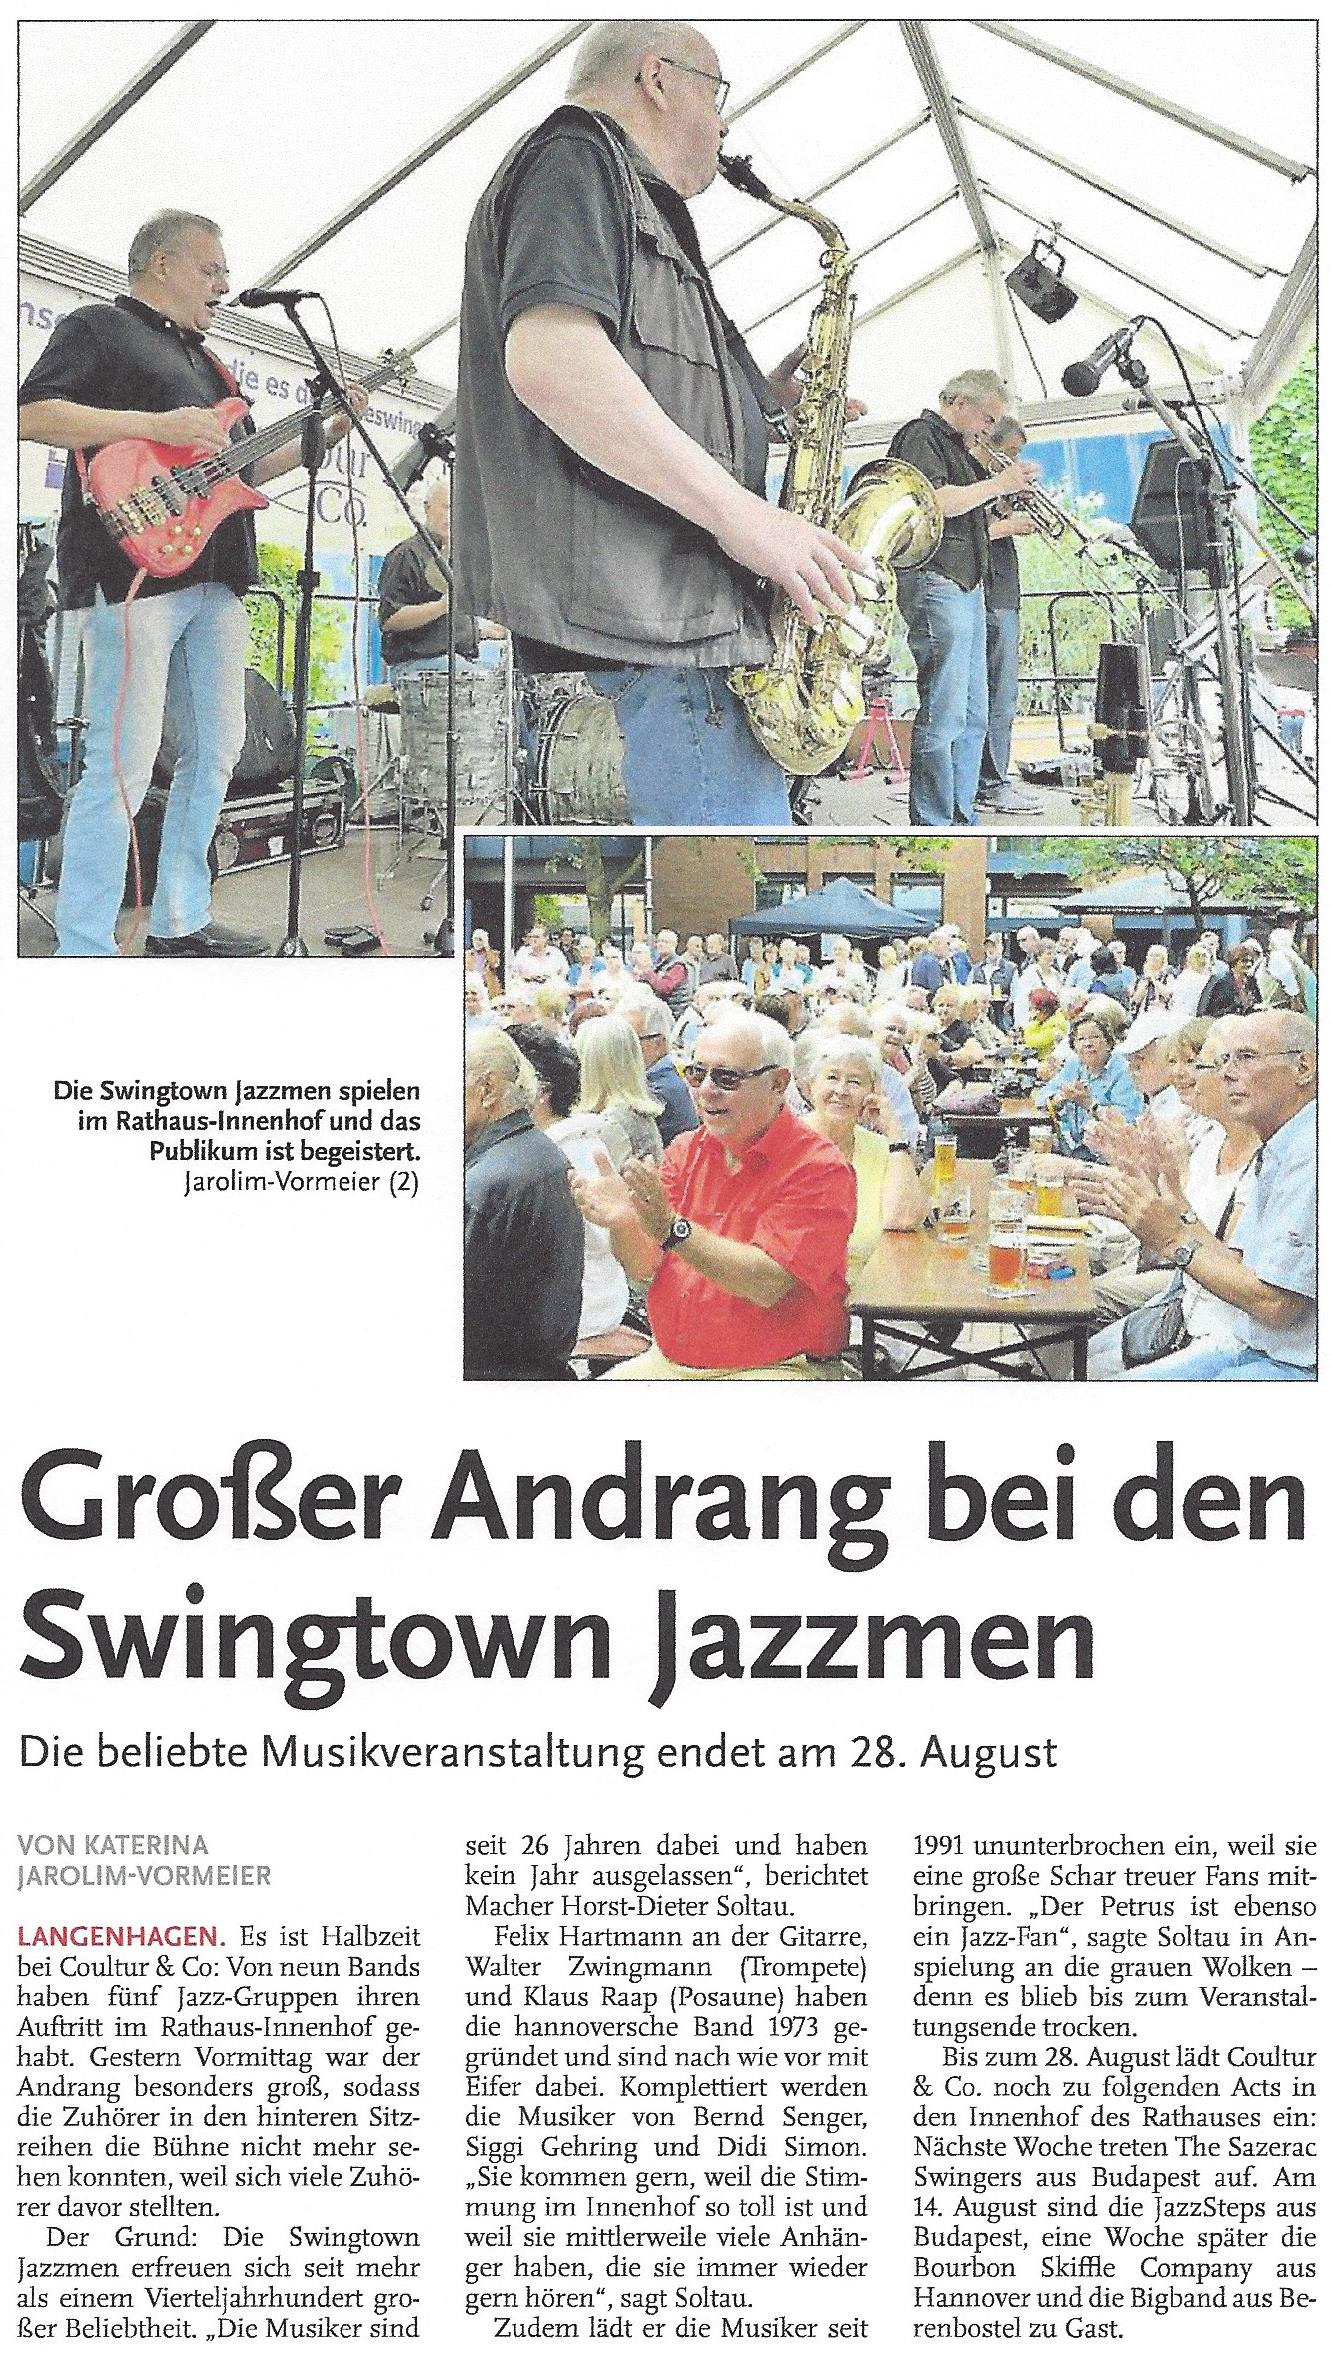 Großer Andrang bei den Swingtown Jazzmen